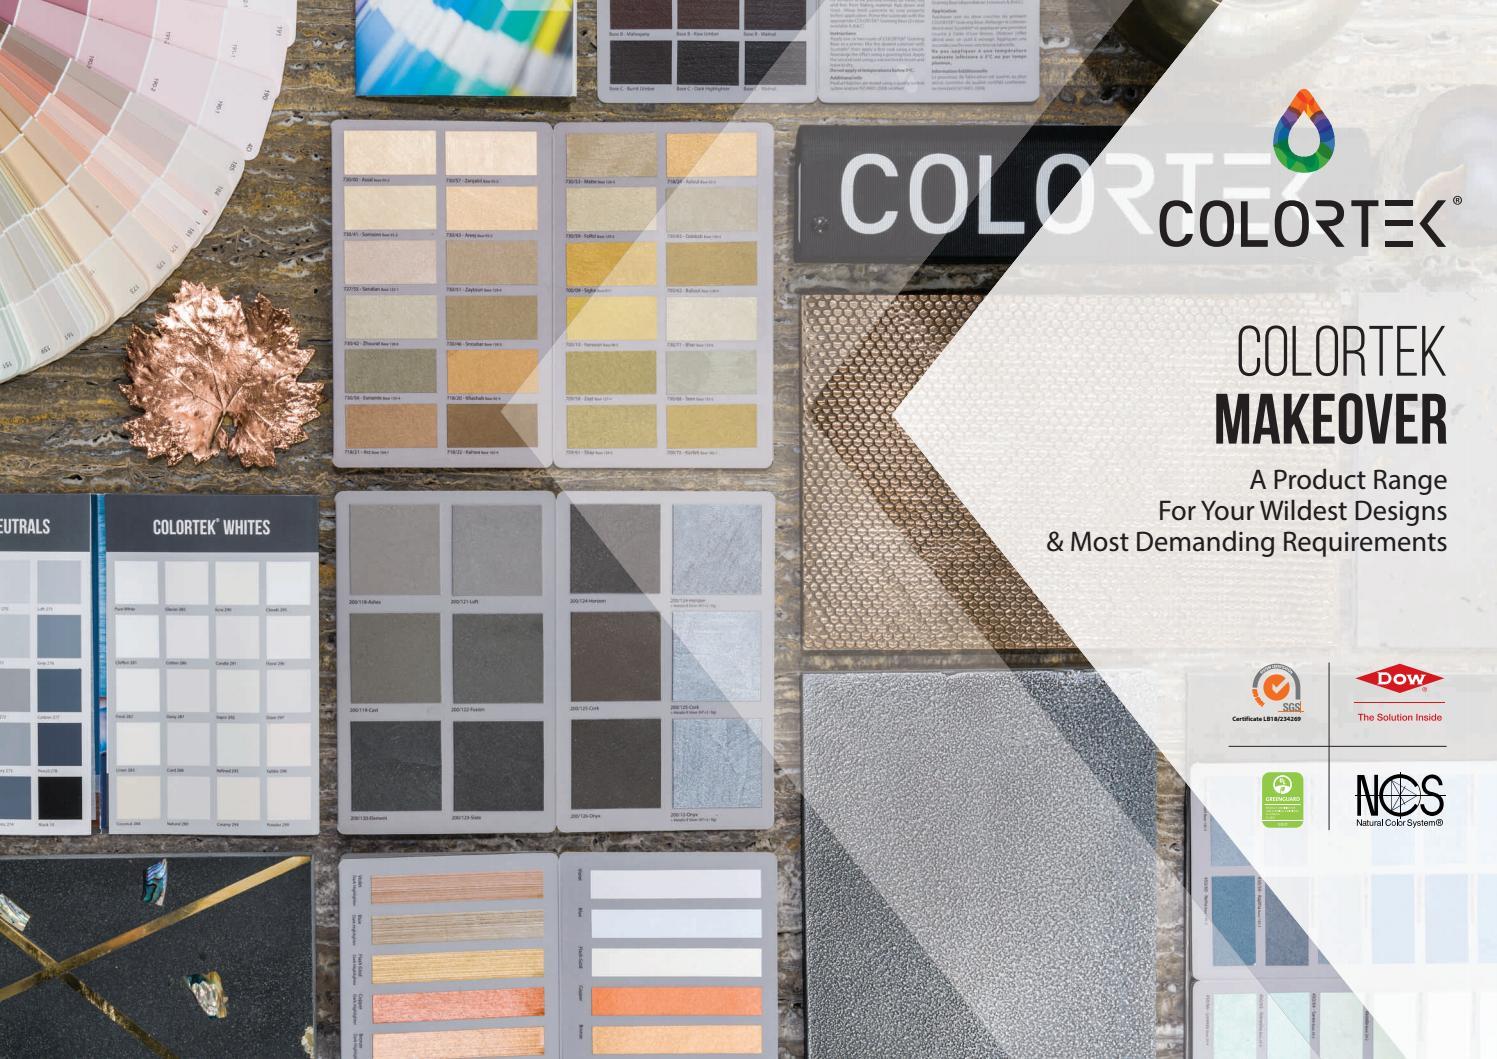 Colortek Makeover Catalogue by Colortek - issuu